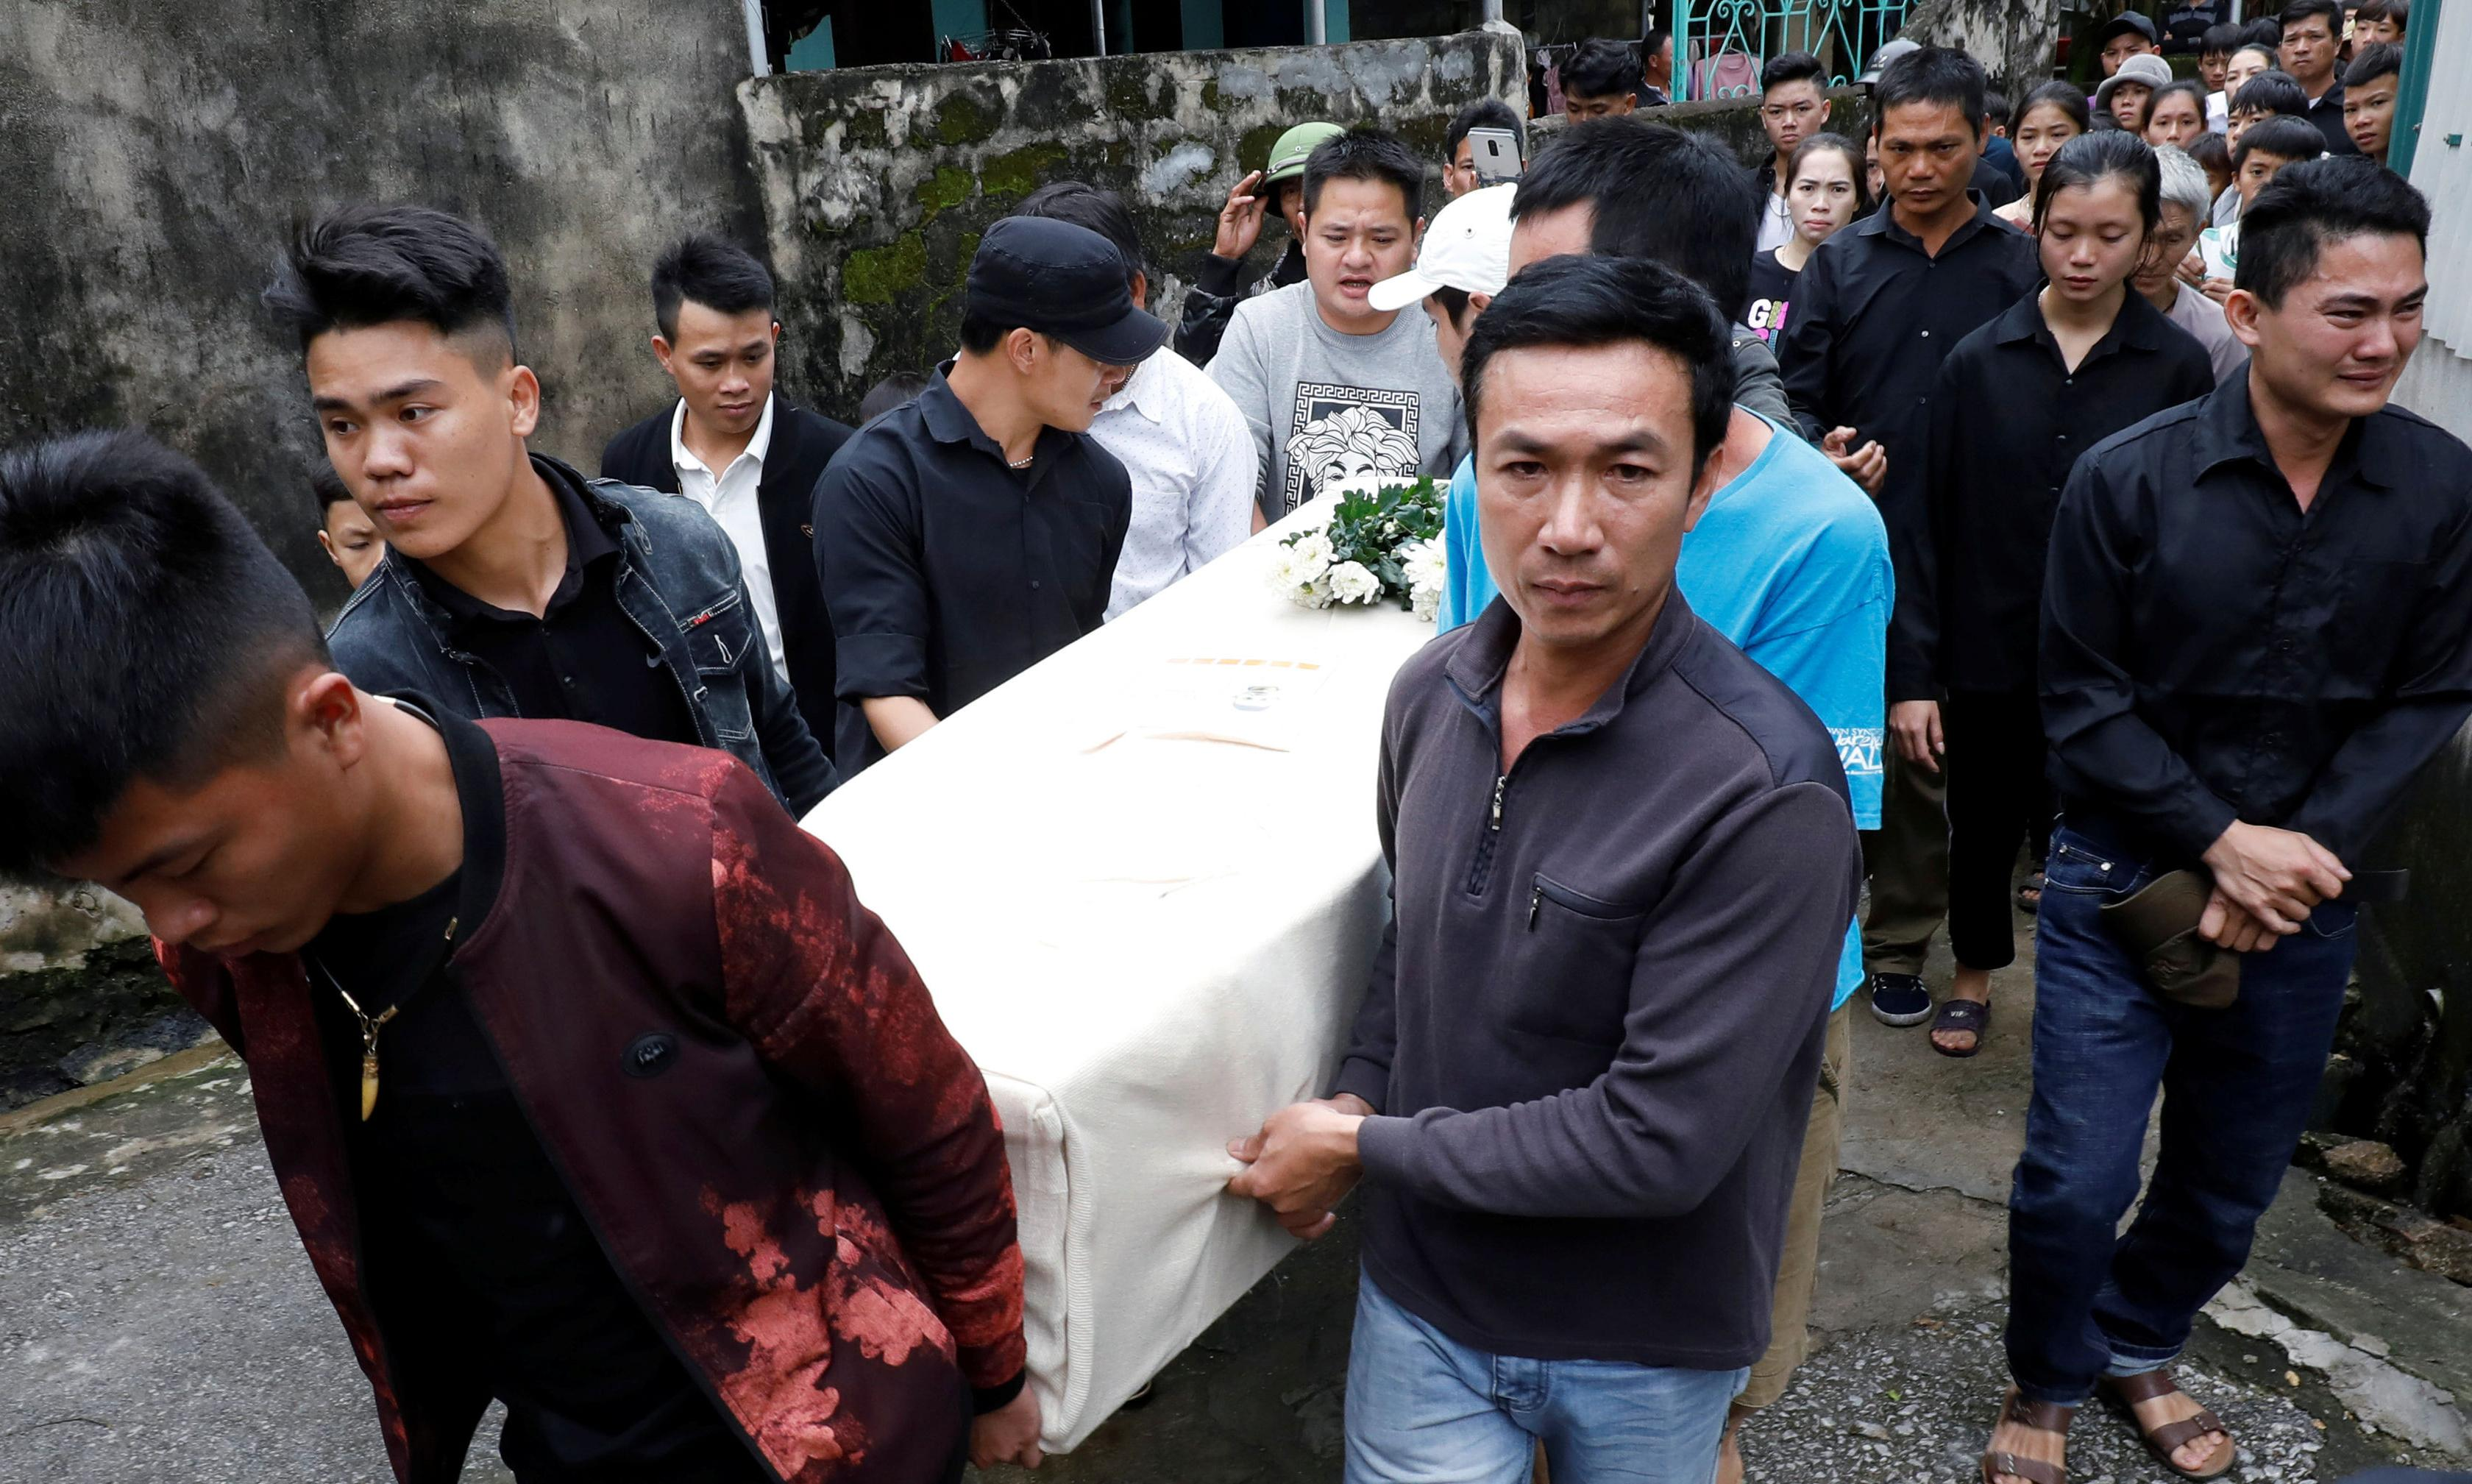 Essex lorry deaths: last of bodies returned to Vietnam